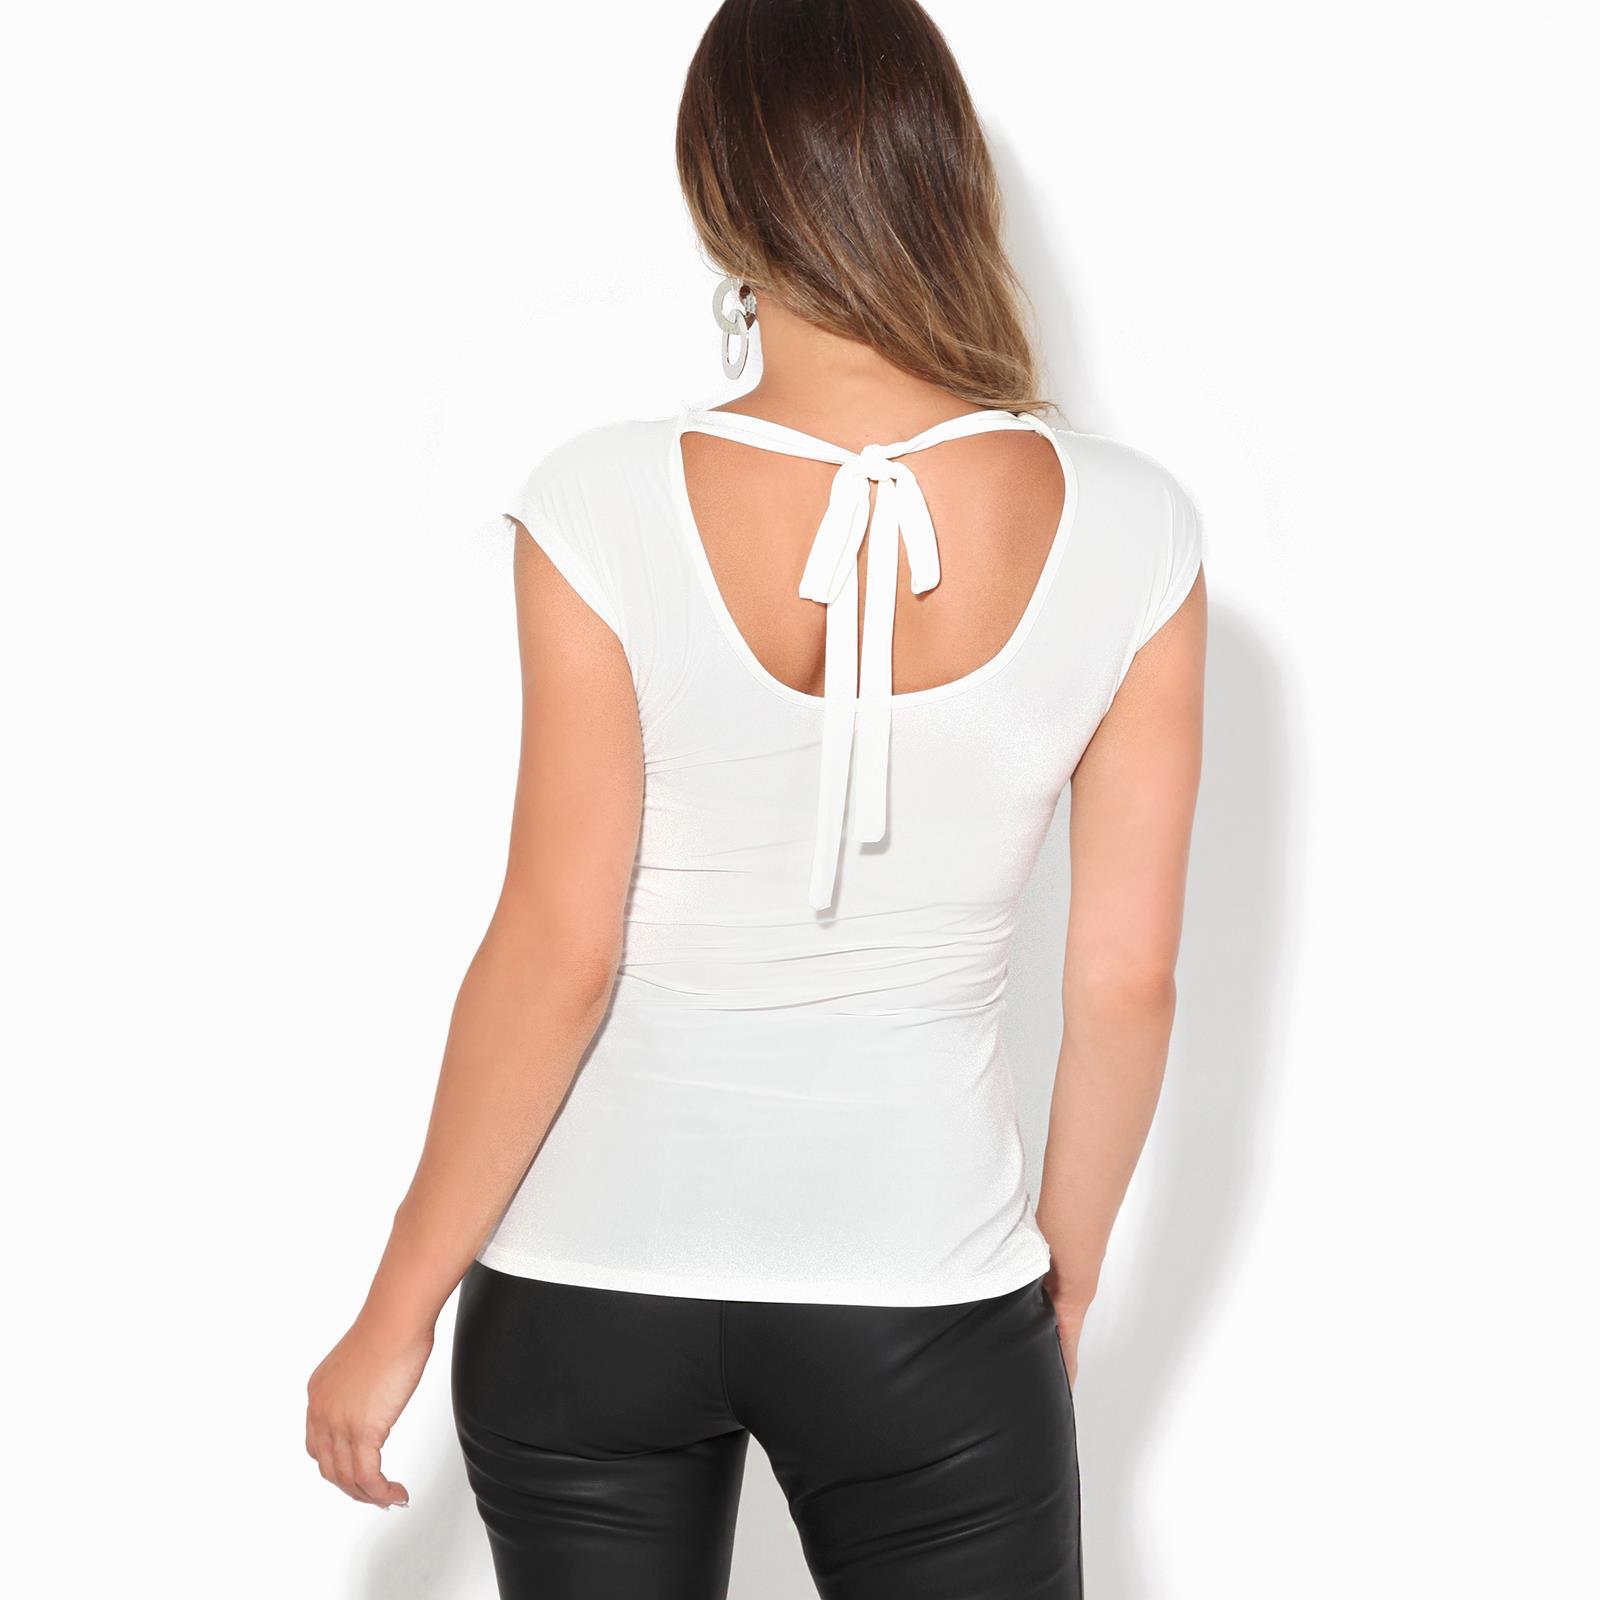 Womens-Ladies-Cowl-Neck-Top-Sleeveless-Silk-Drape-T-Shirt-Low-Cut-Back-Party thumbnail 9